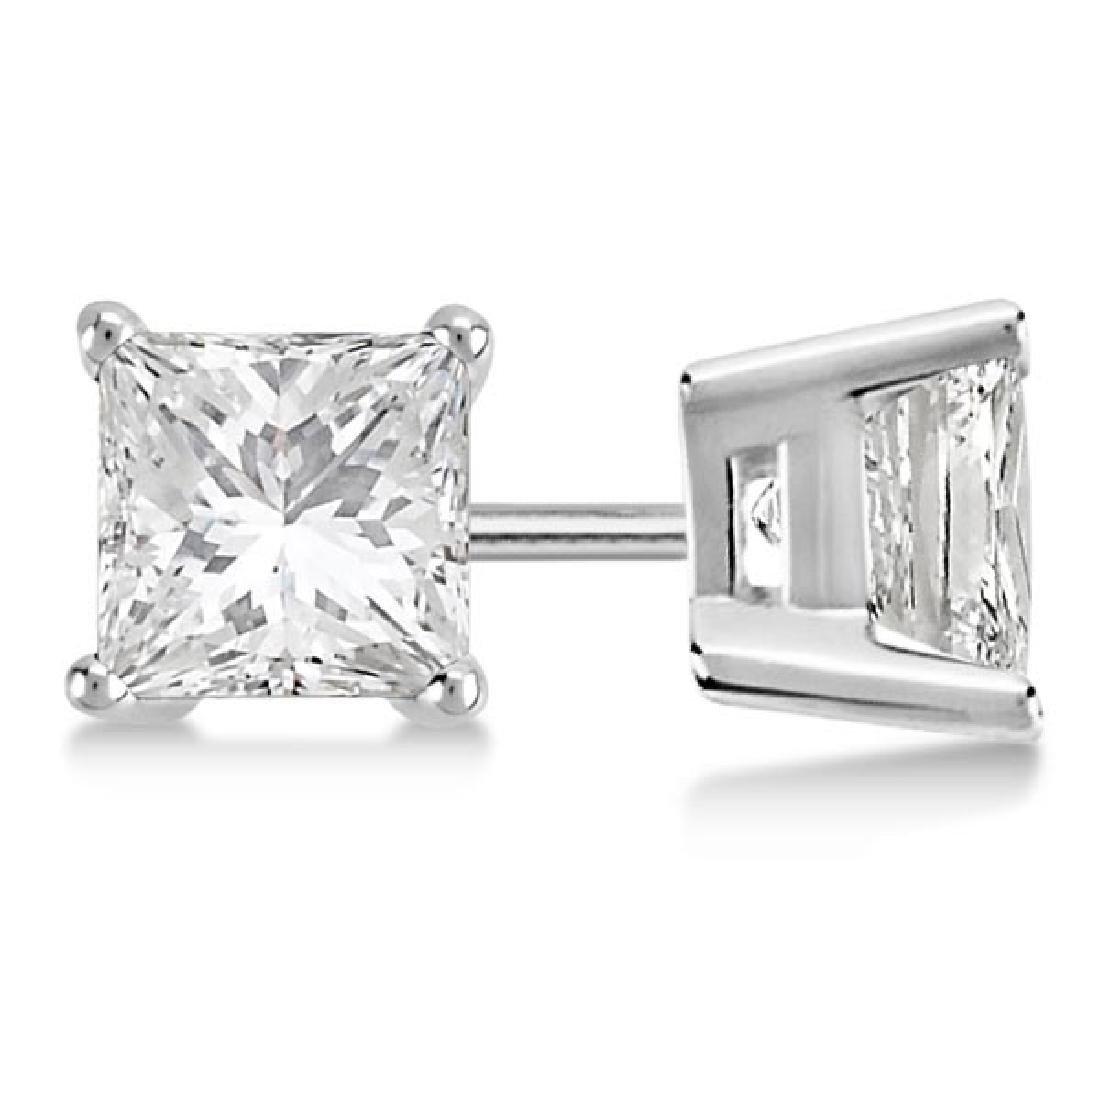 Certified 1 CTW Princess Diamond Stud Earrings H/SI2